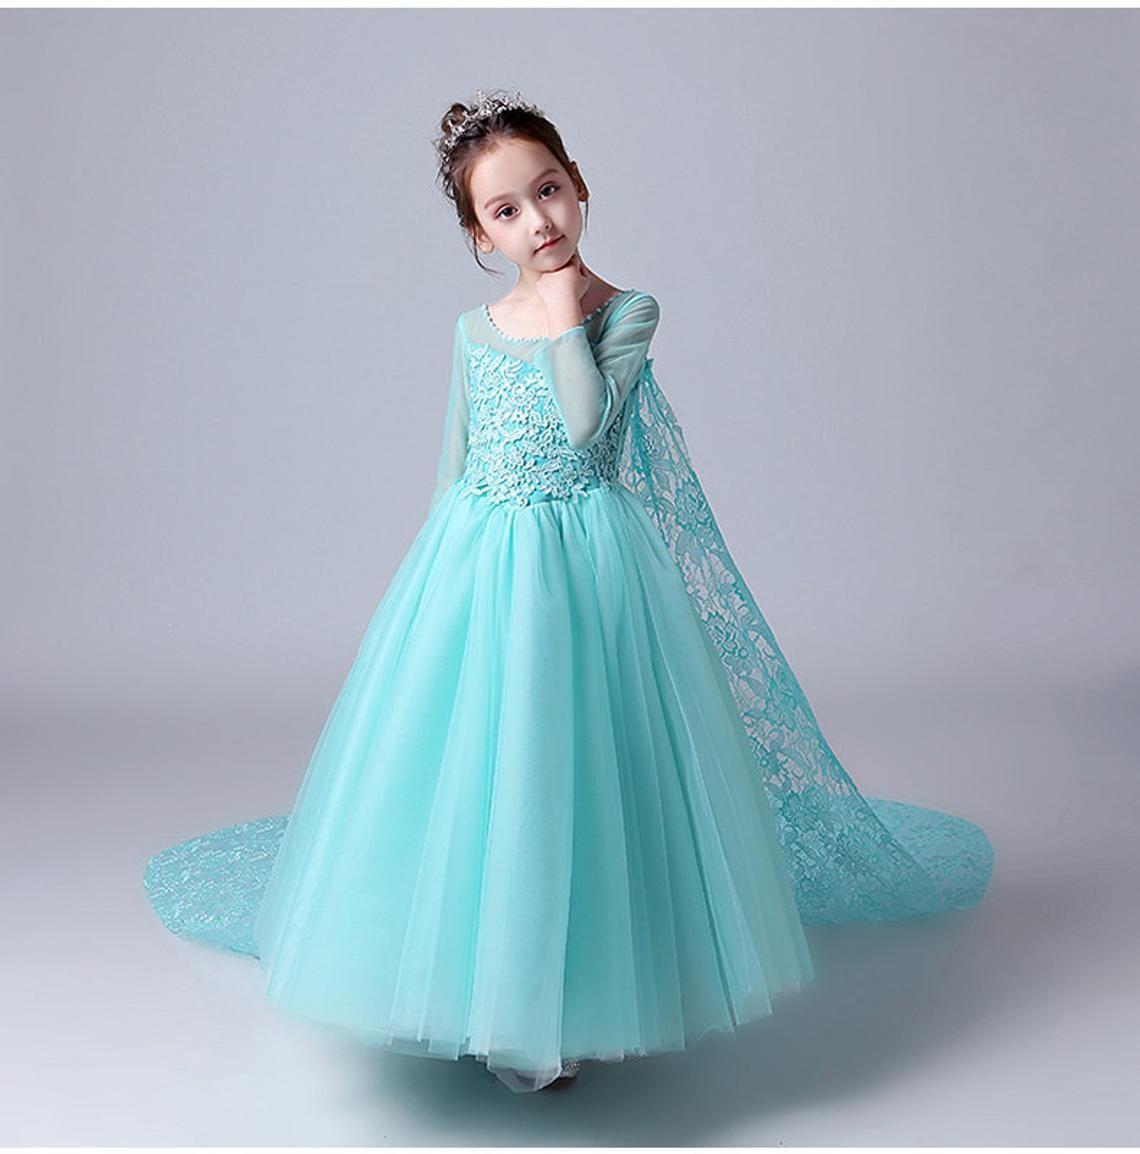 Elsa dress elsa costume toddler Disney princess Frozen